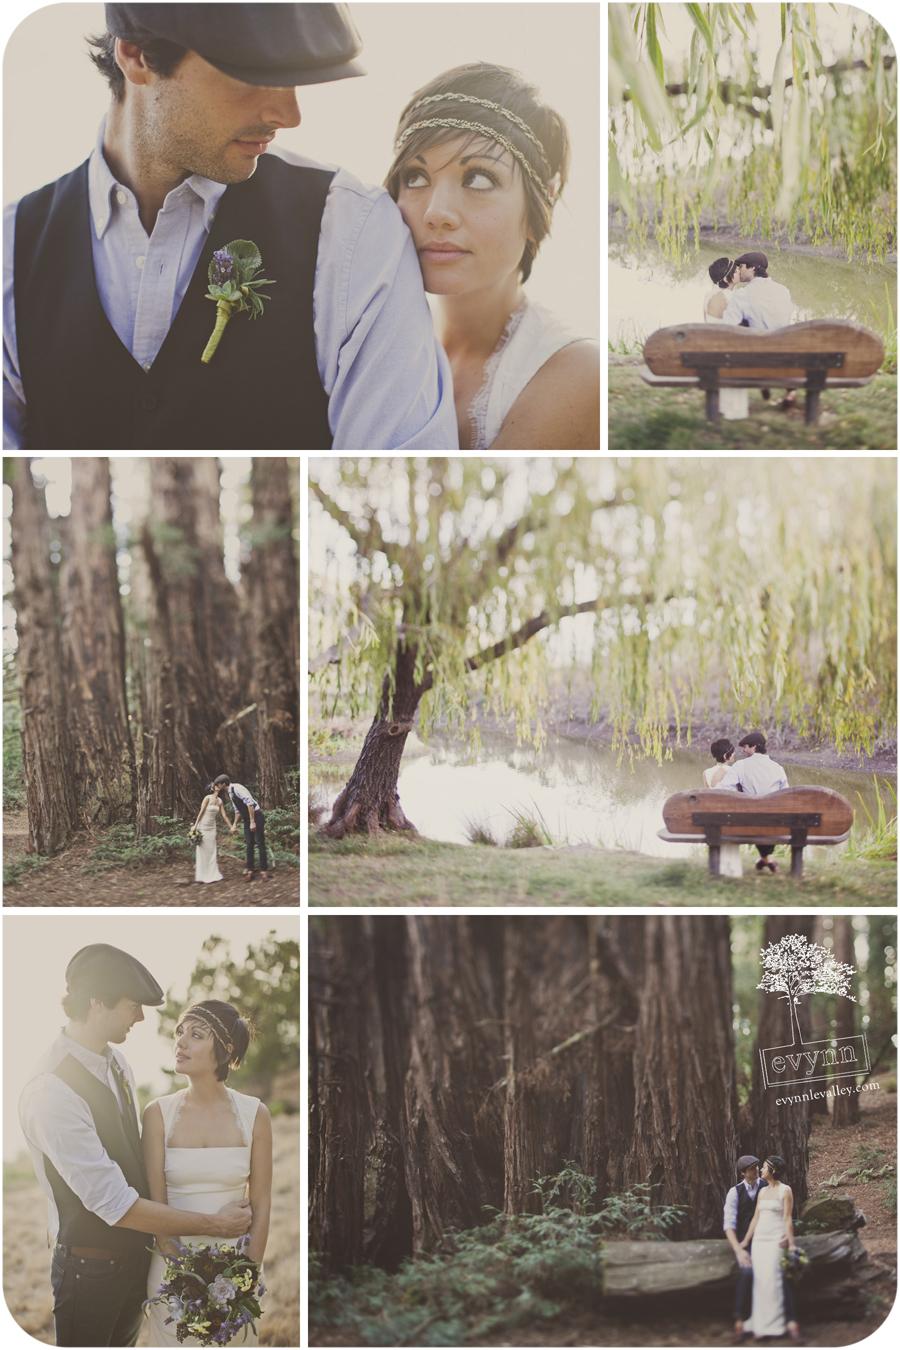 Big Sur, Post Ranch, Wedding, Elopement, Redwoods, Willow Tree, Rustic, Vintage, Couple, California